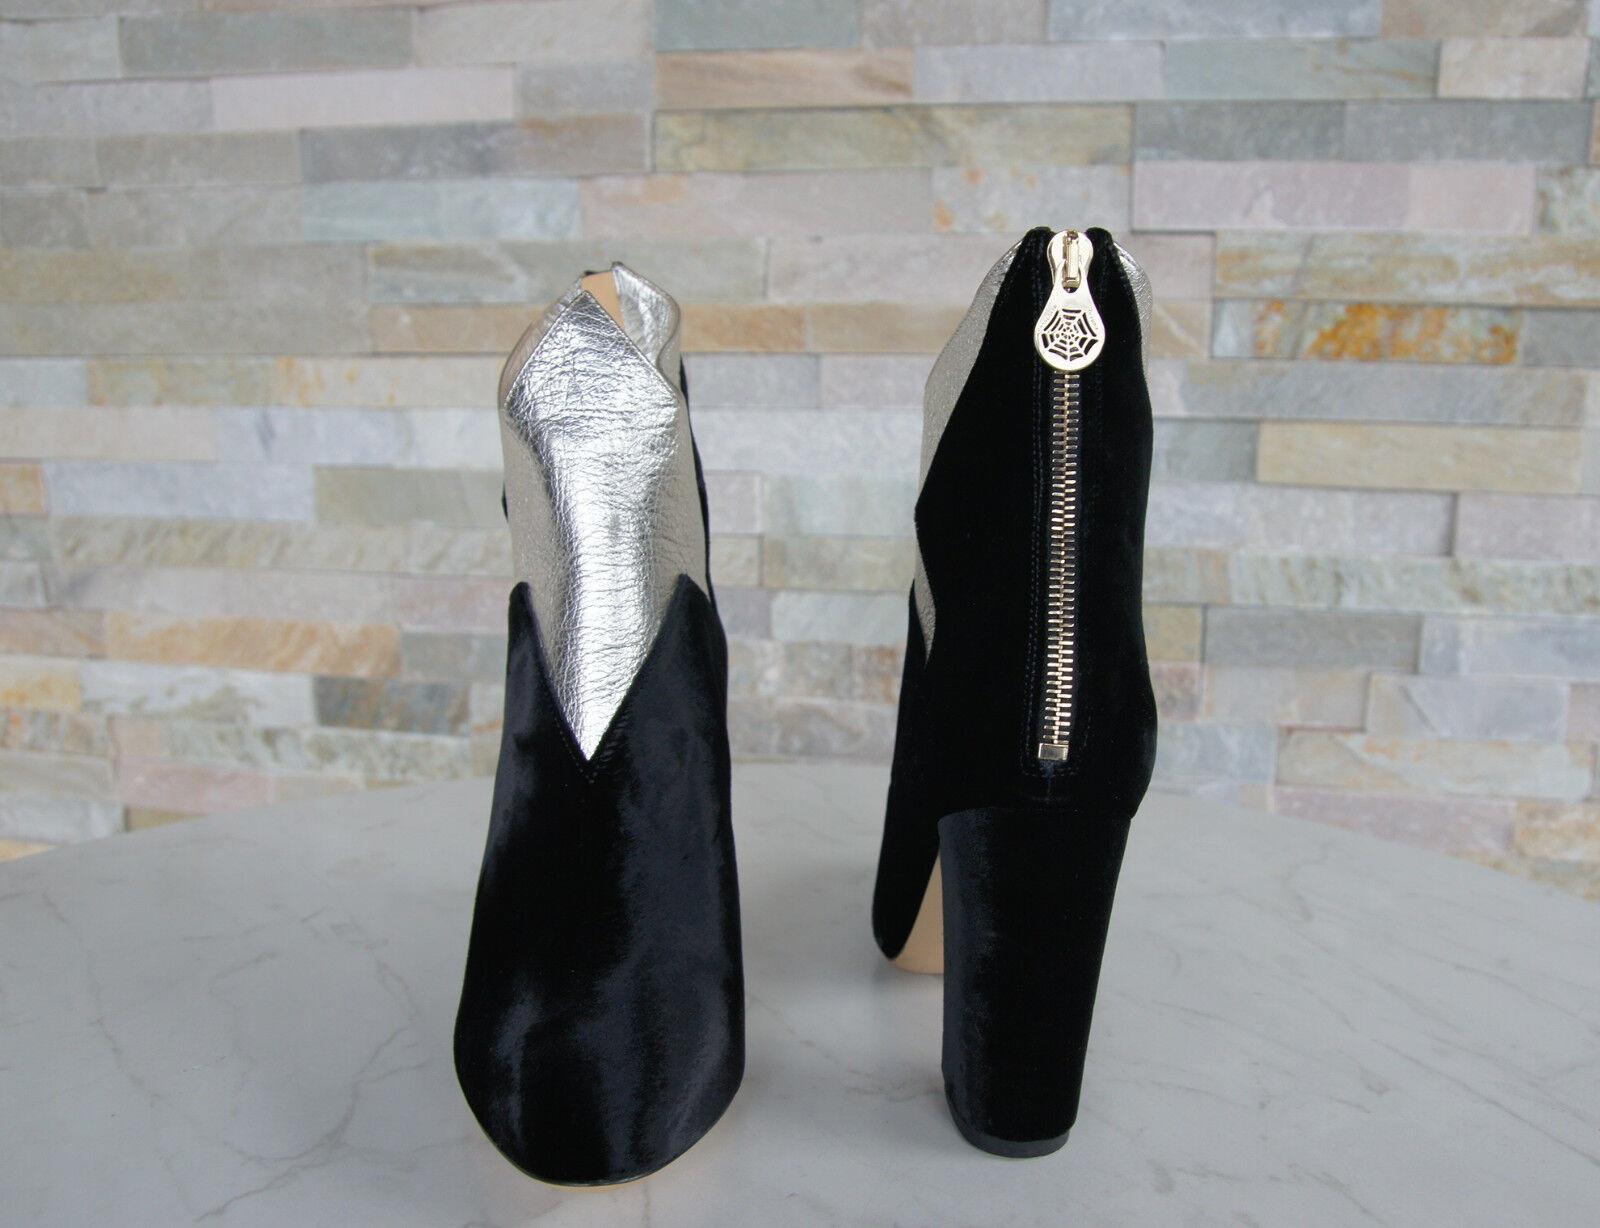 De Luxe Charlotte Olympia 40 40 40 Bottines Bottines Chaussures Velours Neuf Autrefois e45154